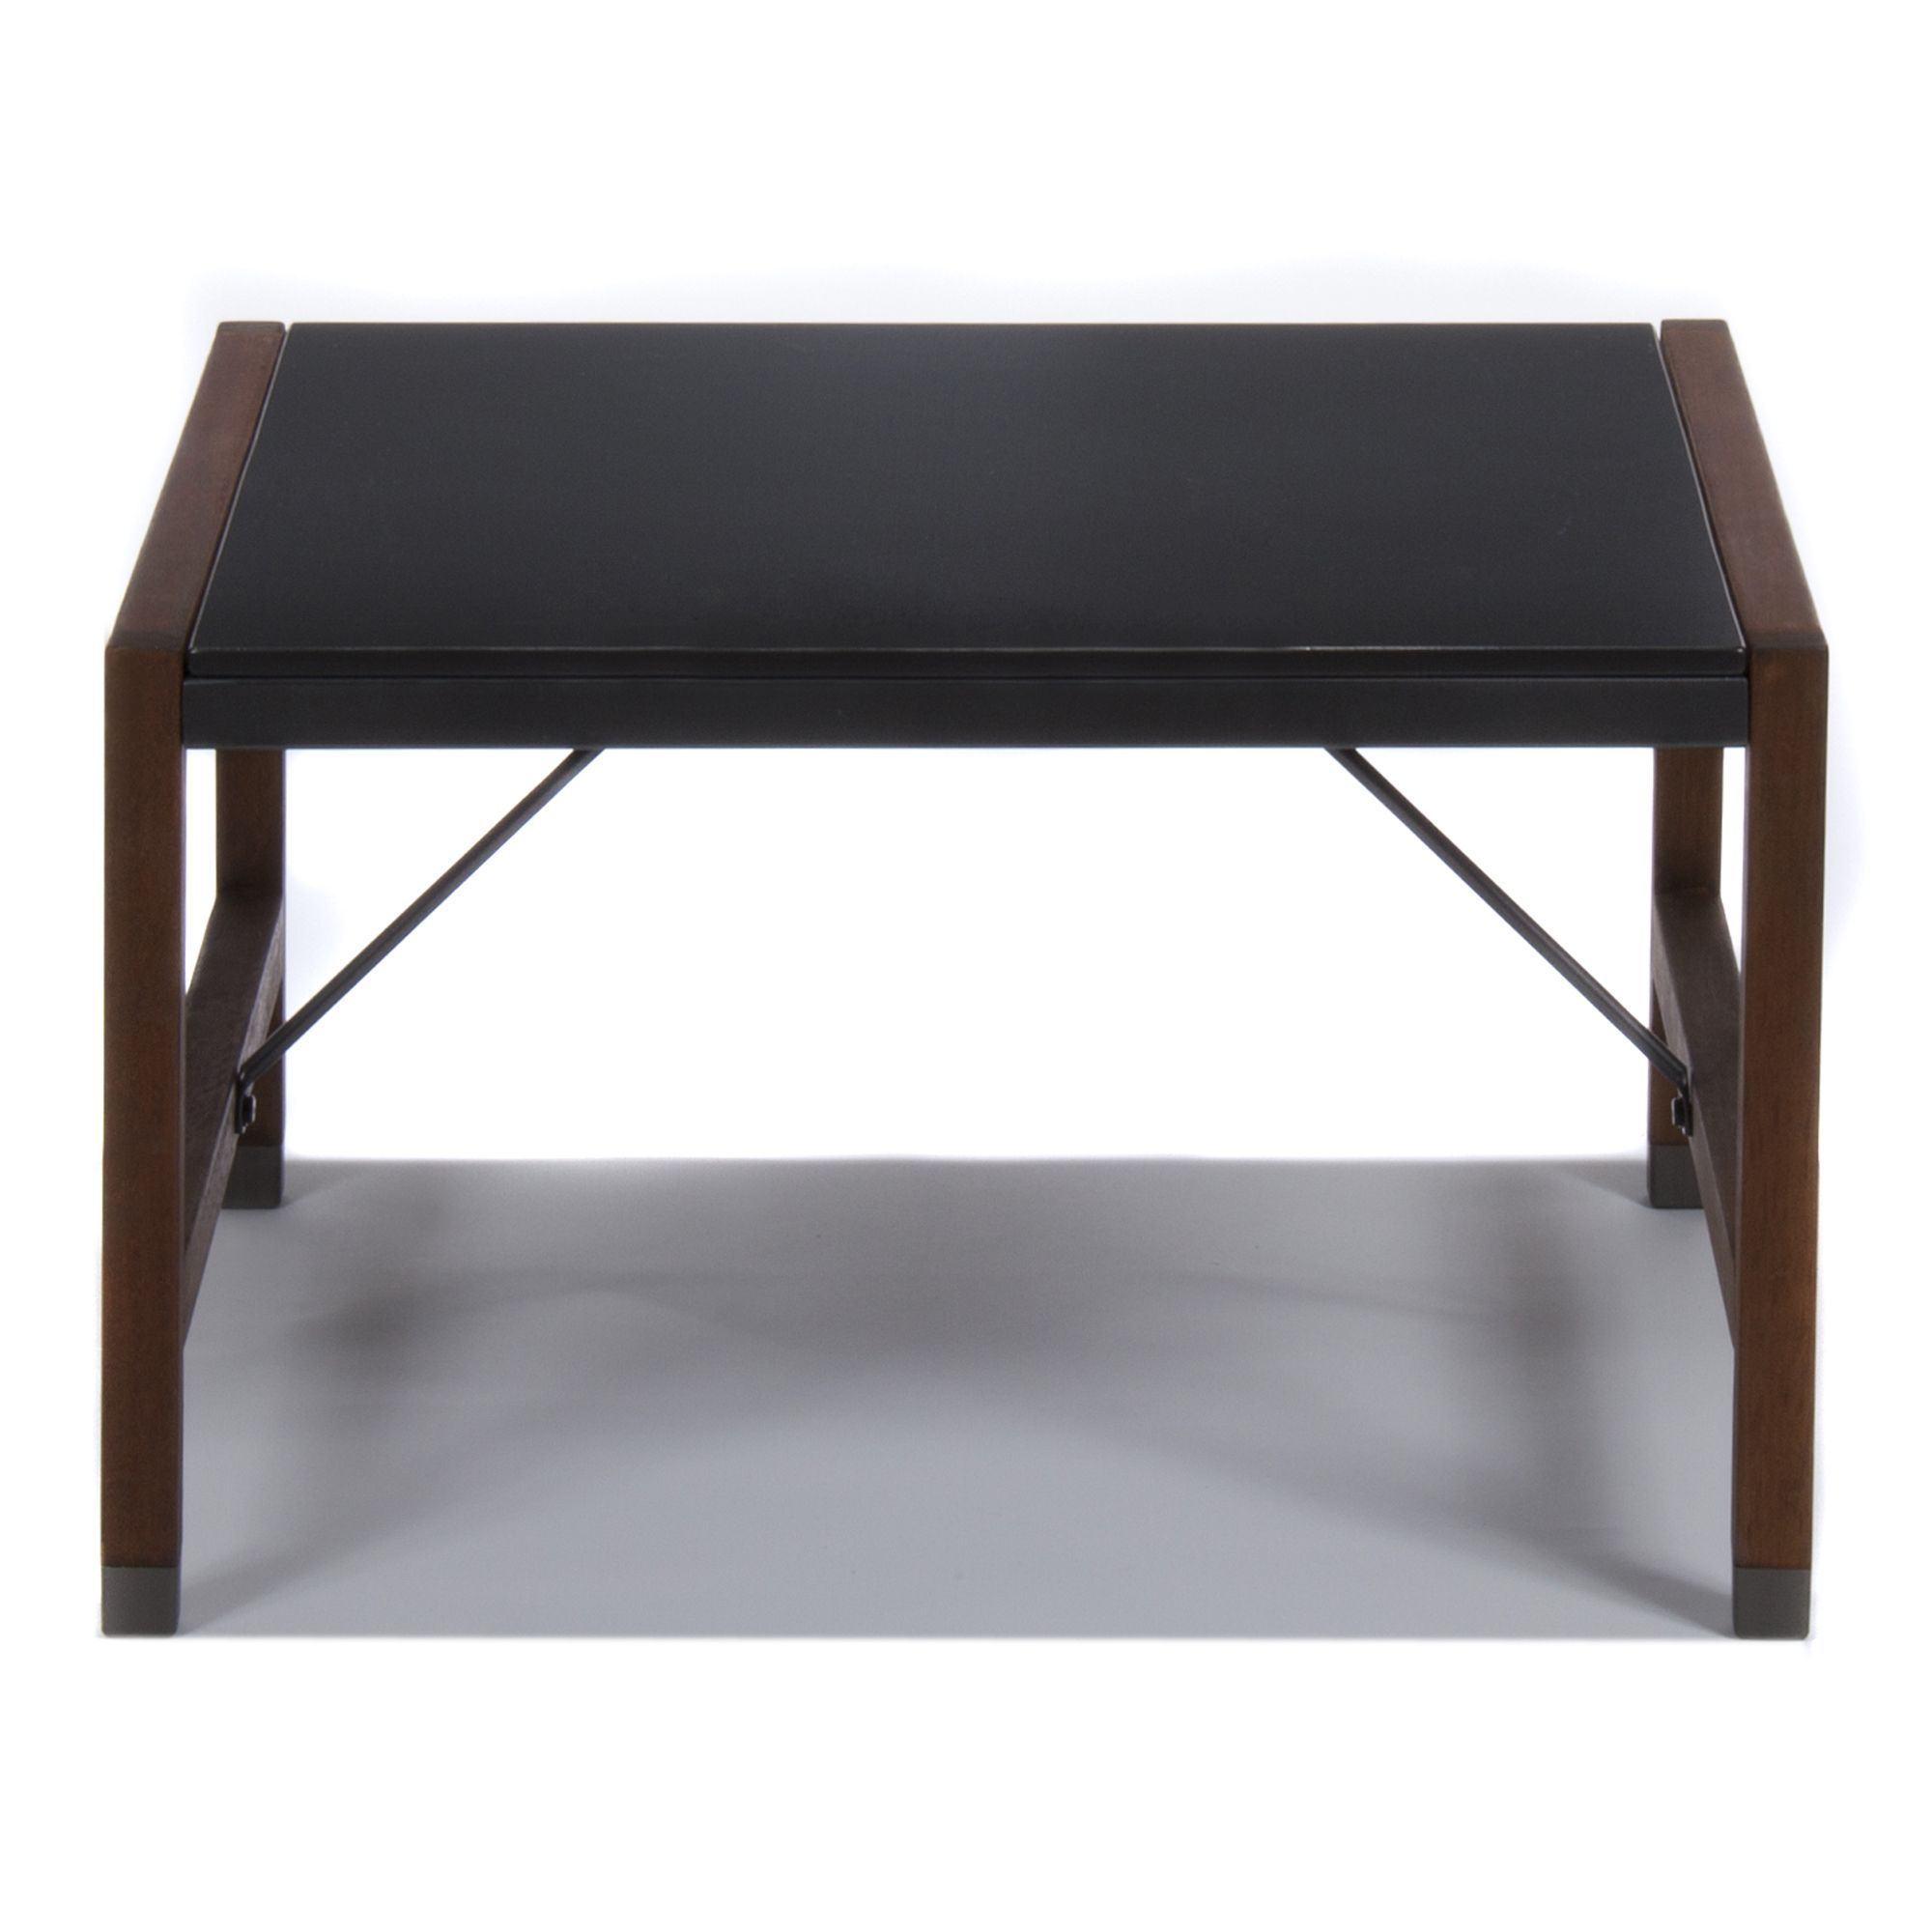 €99 alinea 70x70xh42 fibrociment Table basse de jardin rétro Noir ...